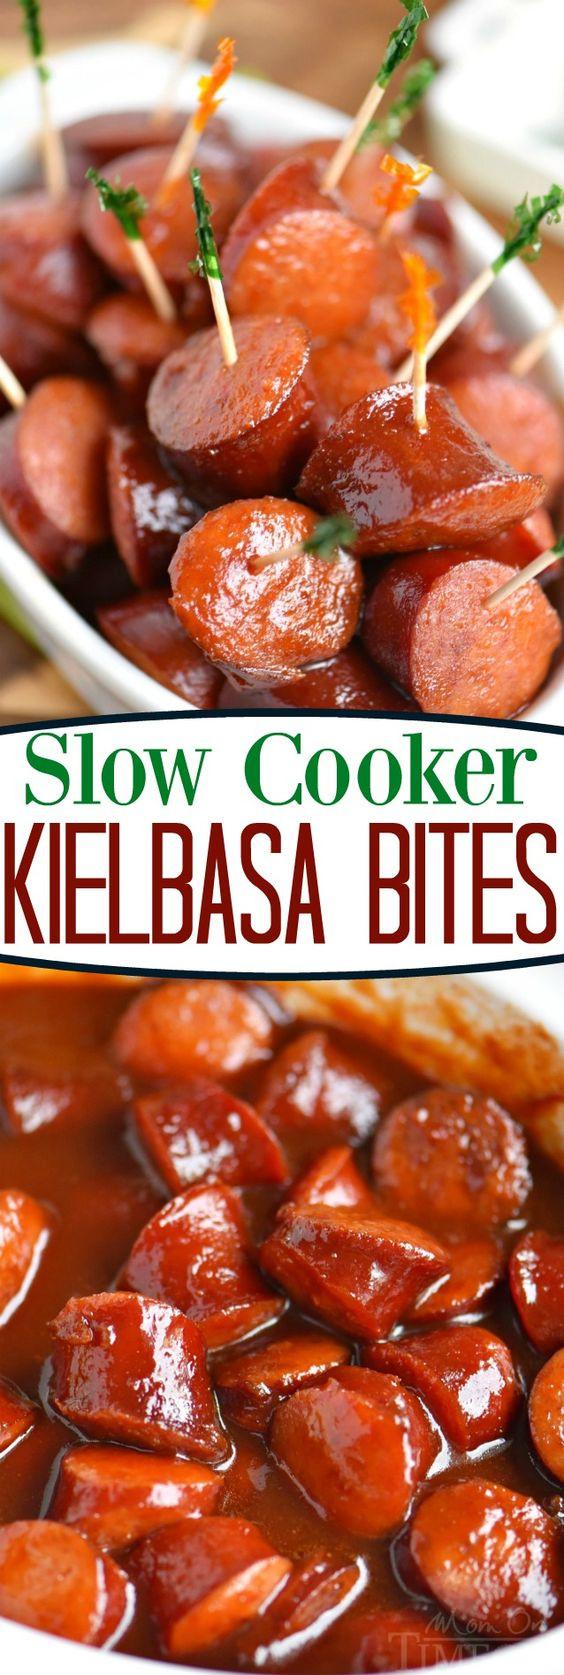 Slow Cooker Appetizers  Slow Cooker Kielbasa Bites Recipe